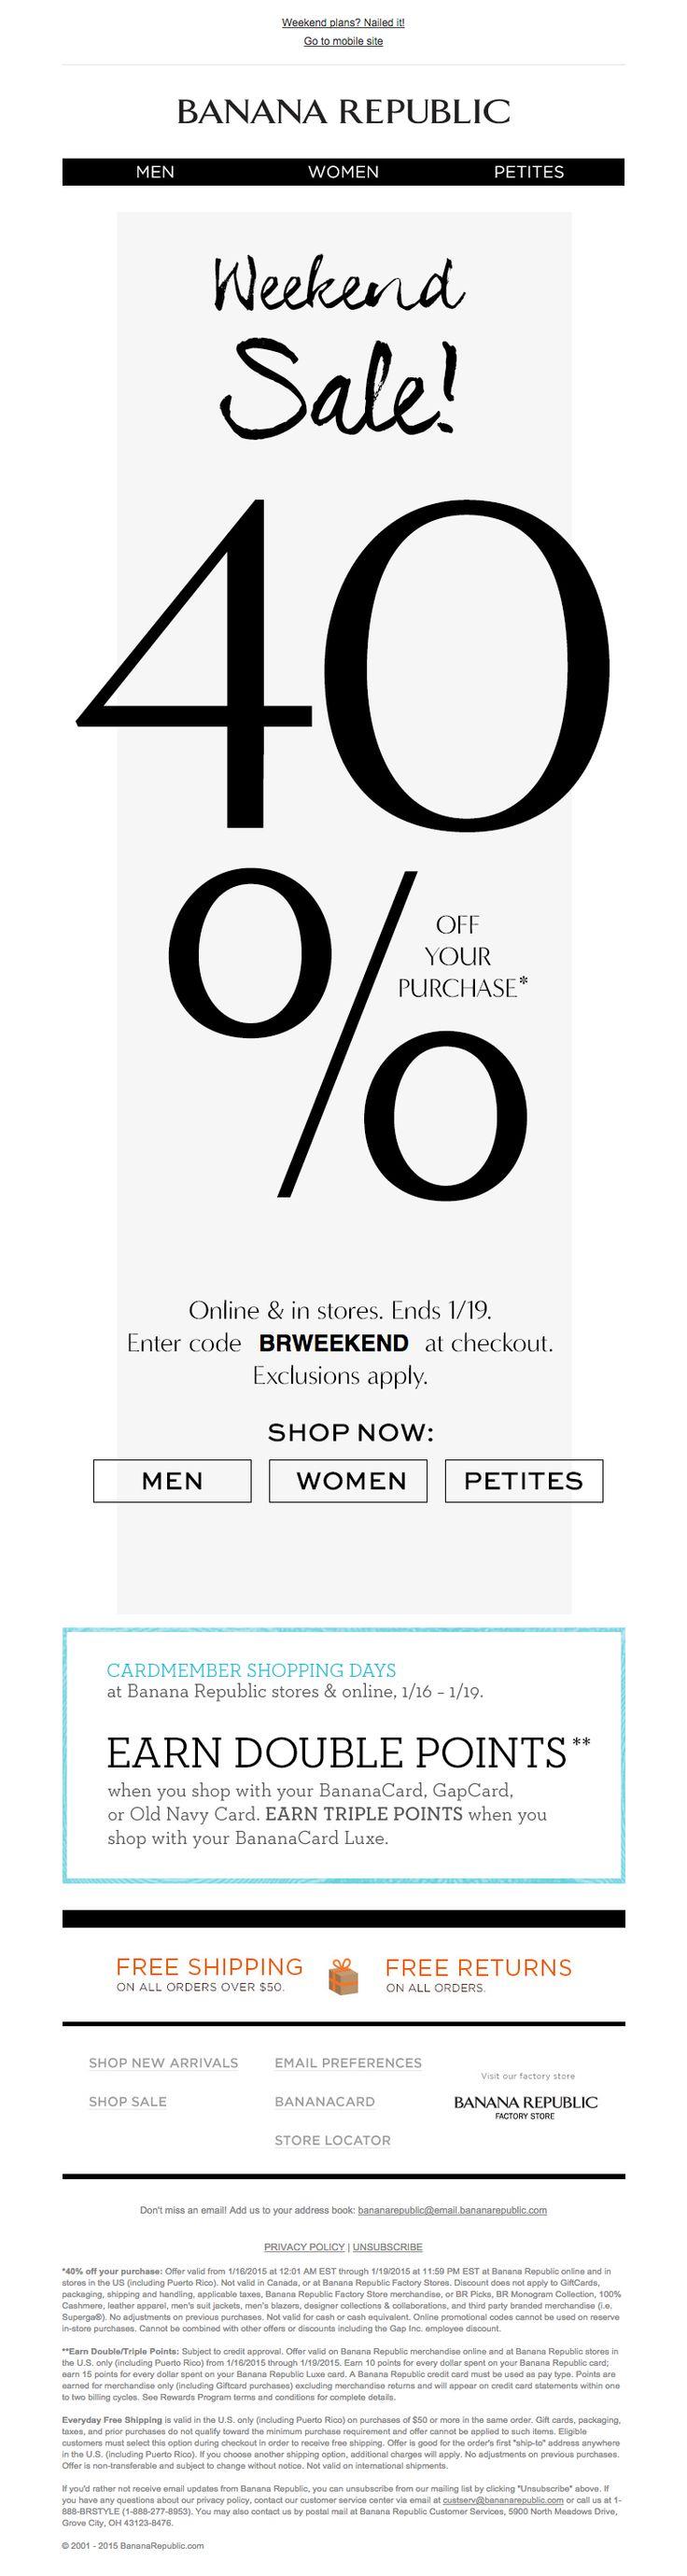 Banana Republic weekend sale 40% off